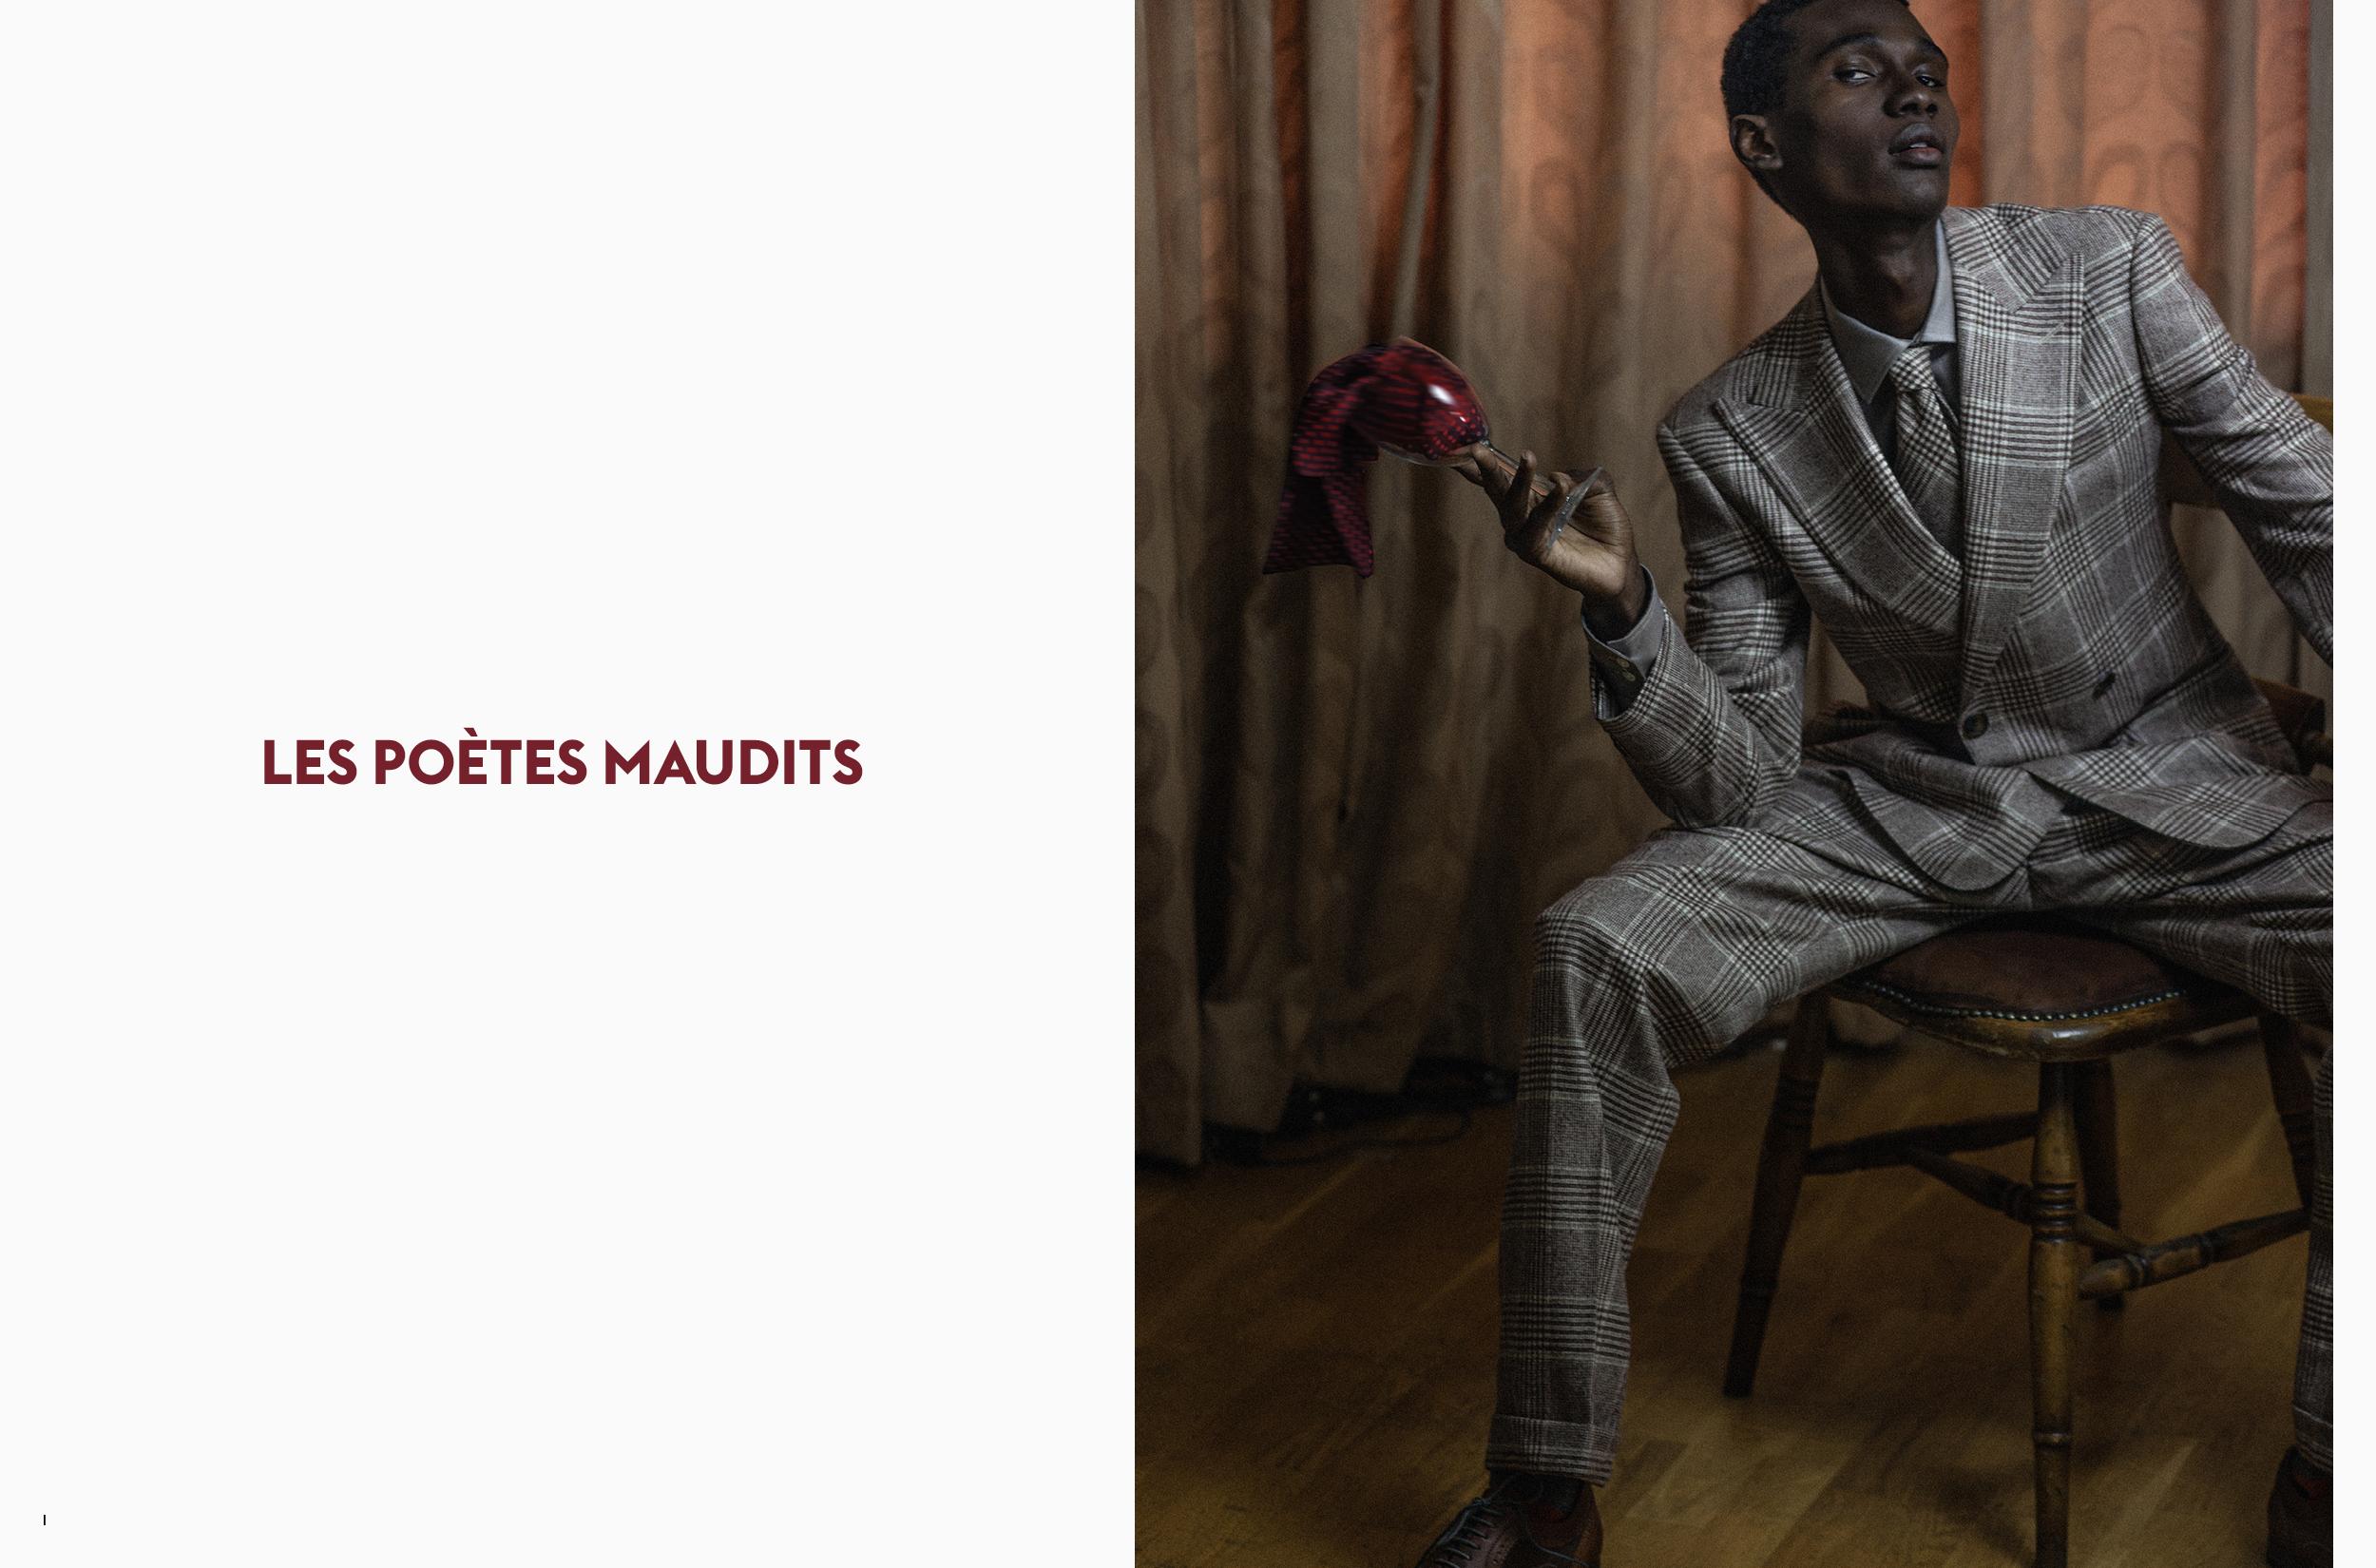 PD1606 [Les Poetes Maudits] P01.jpg